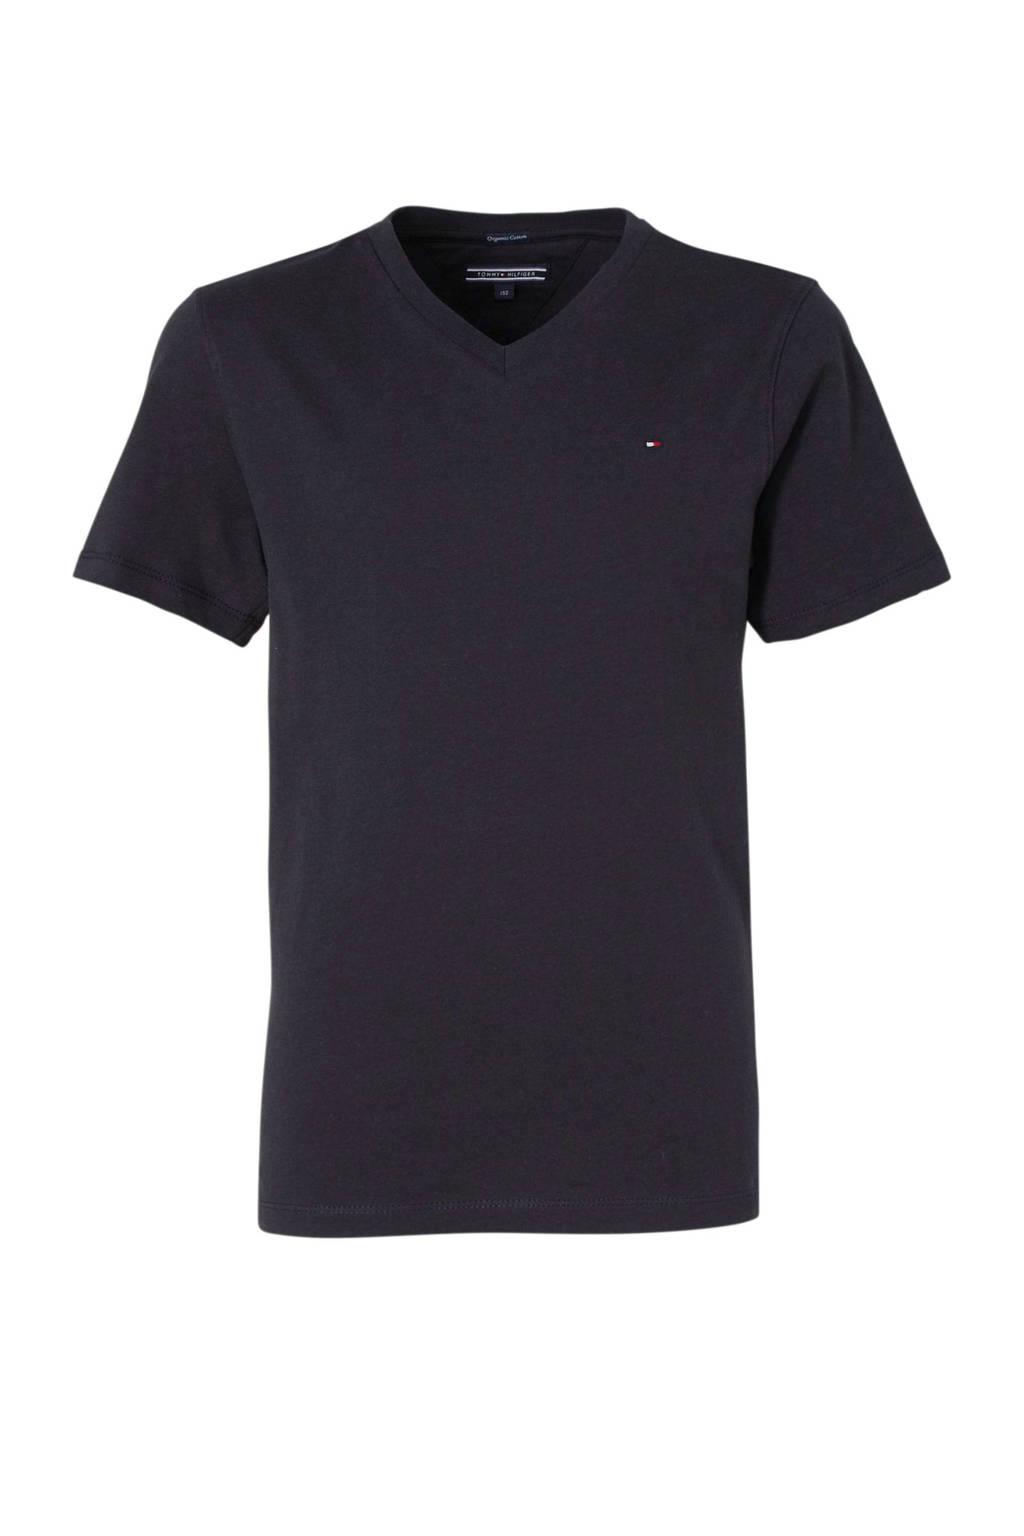 Tommy Hilfiger T-shirt donkerblauw, Donkerblauw